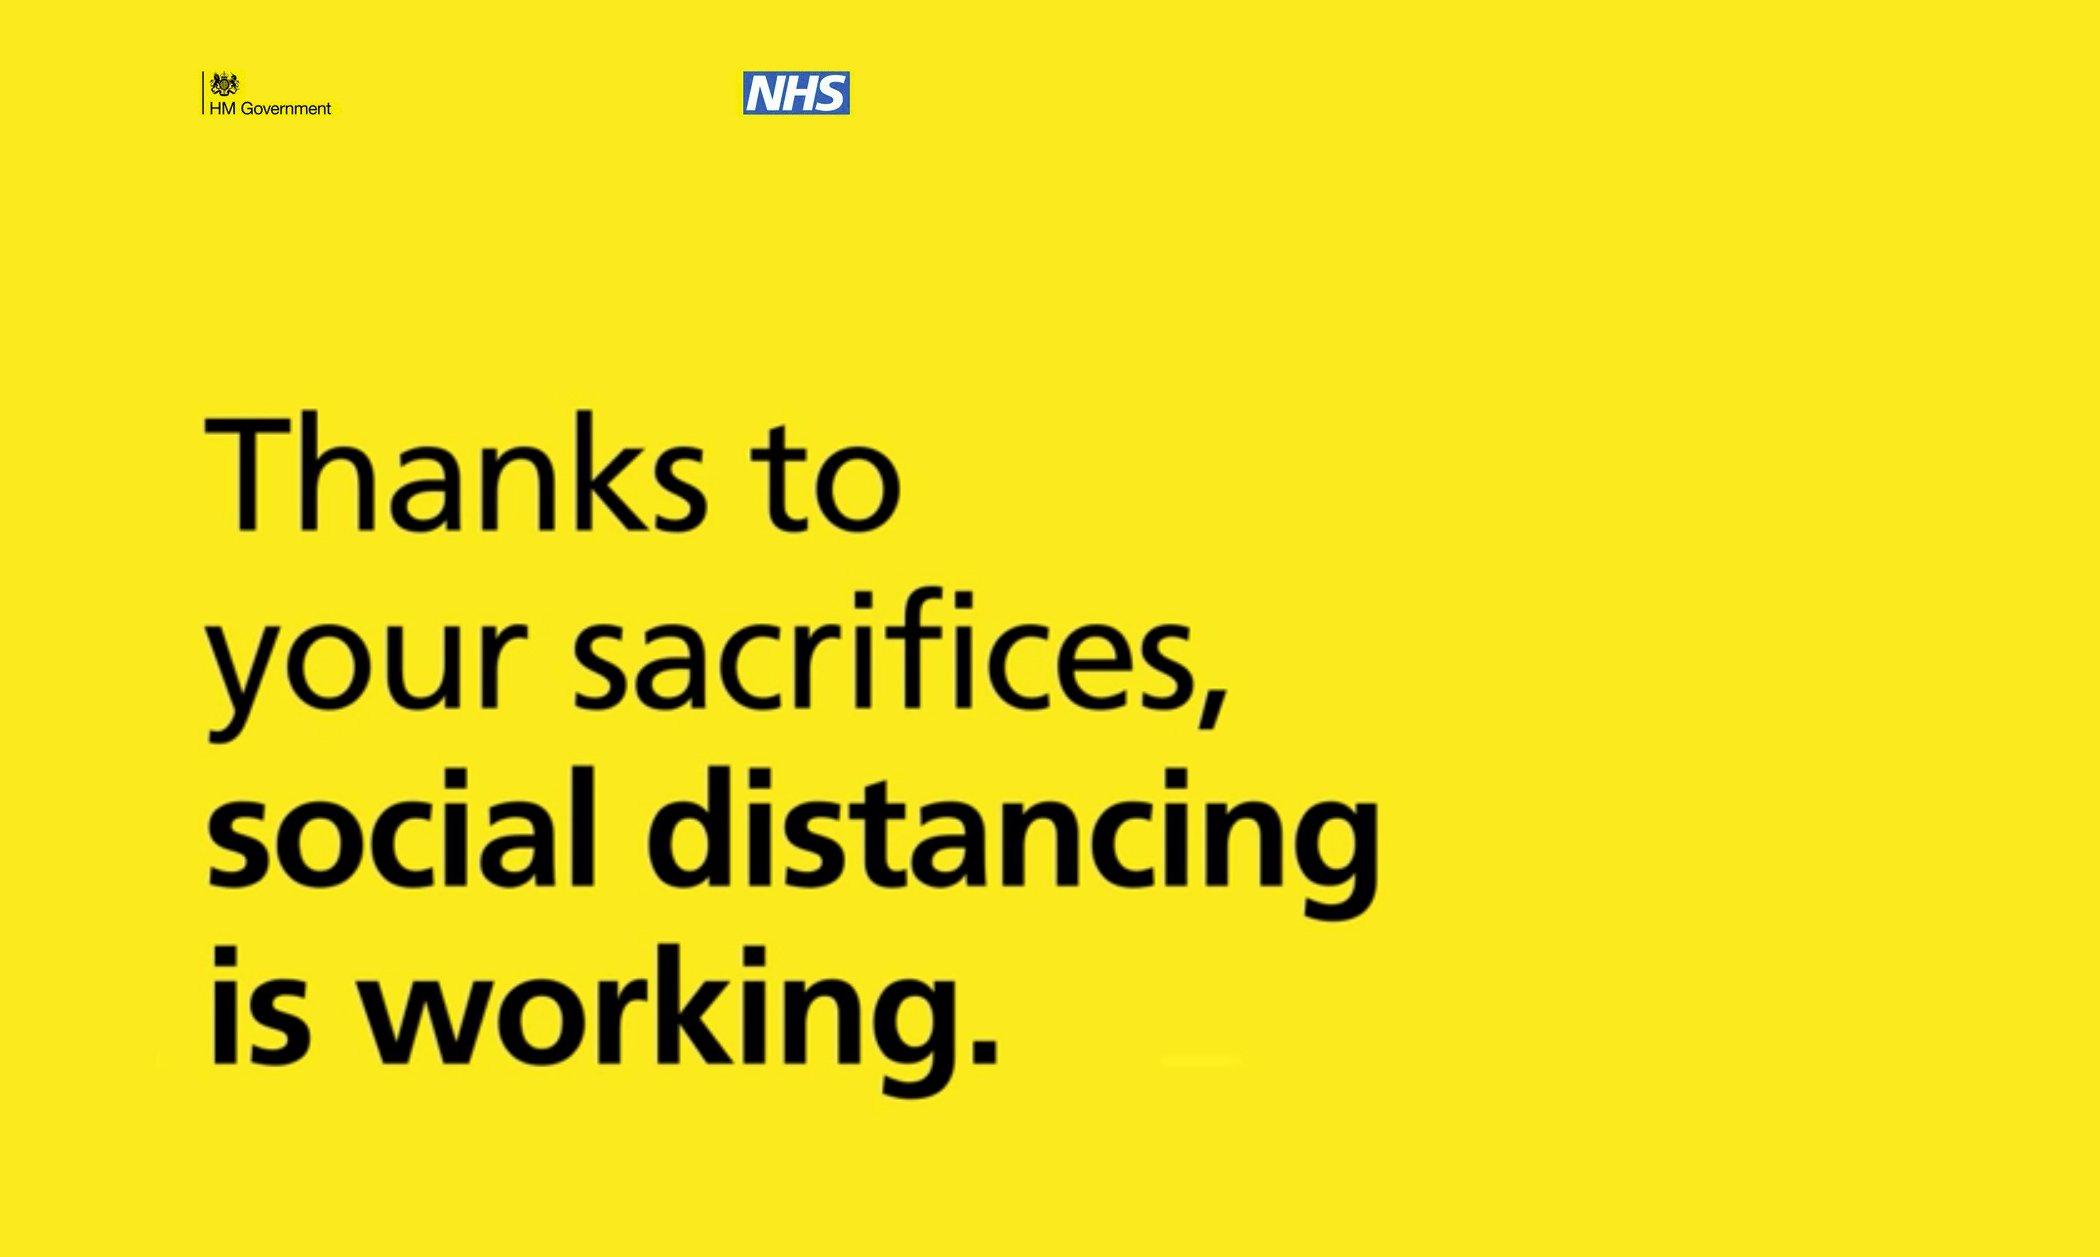 NHS social distancing is working